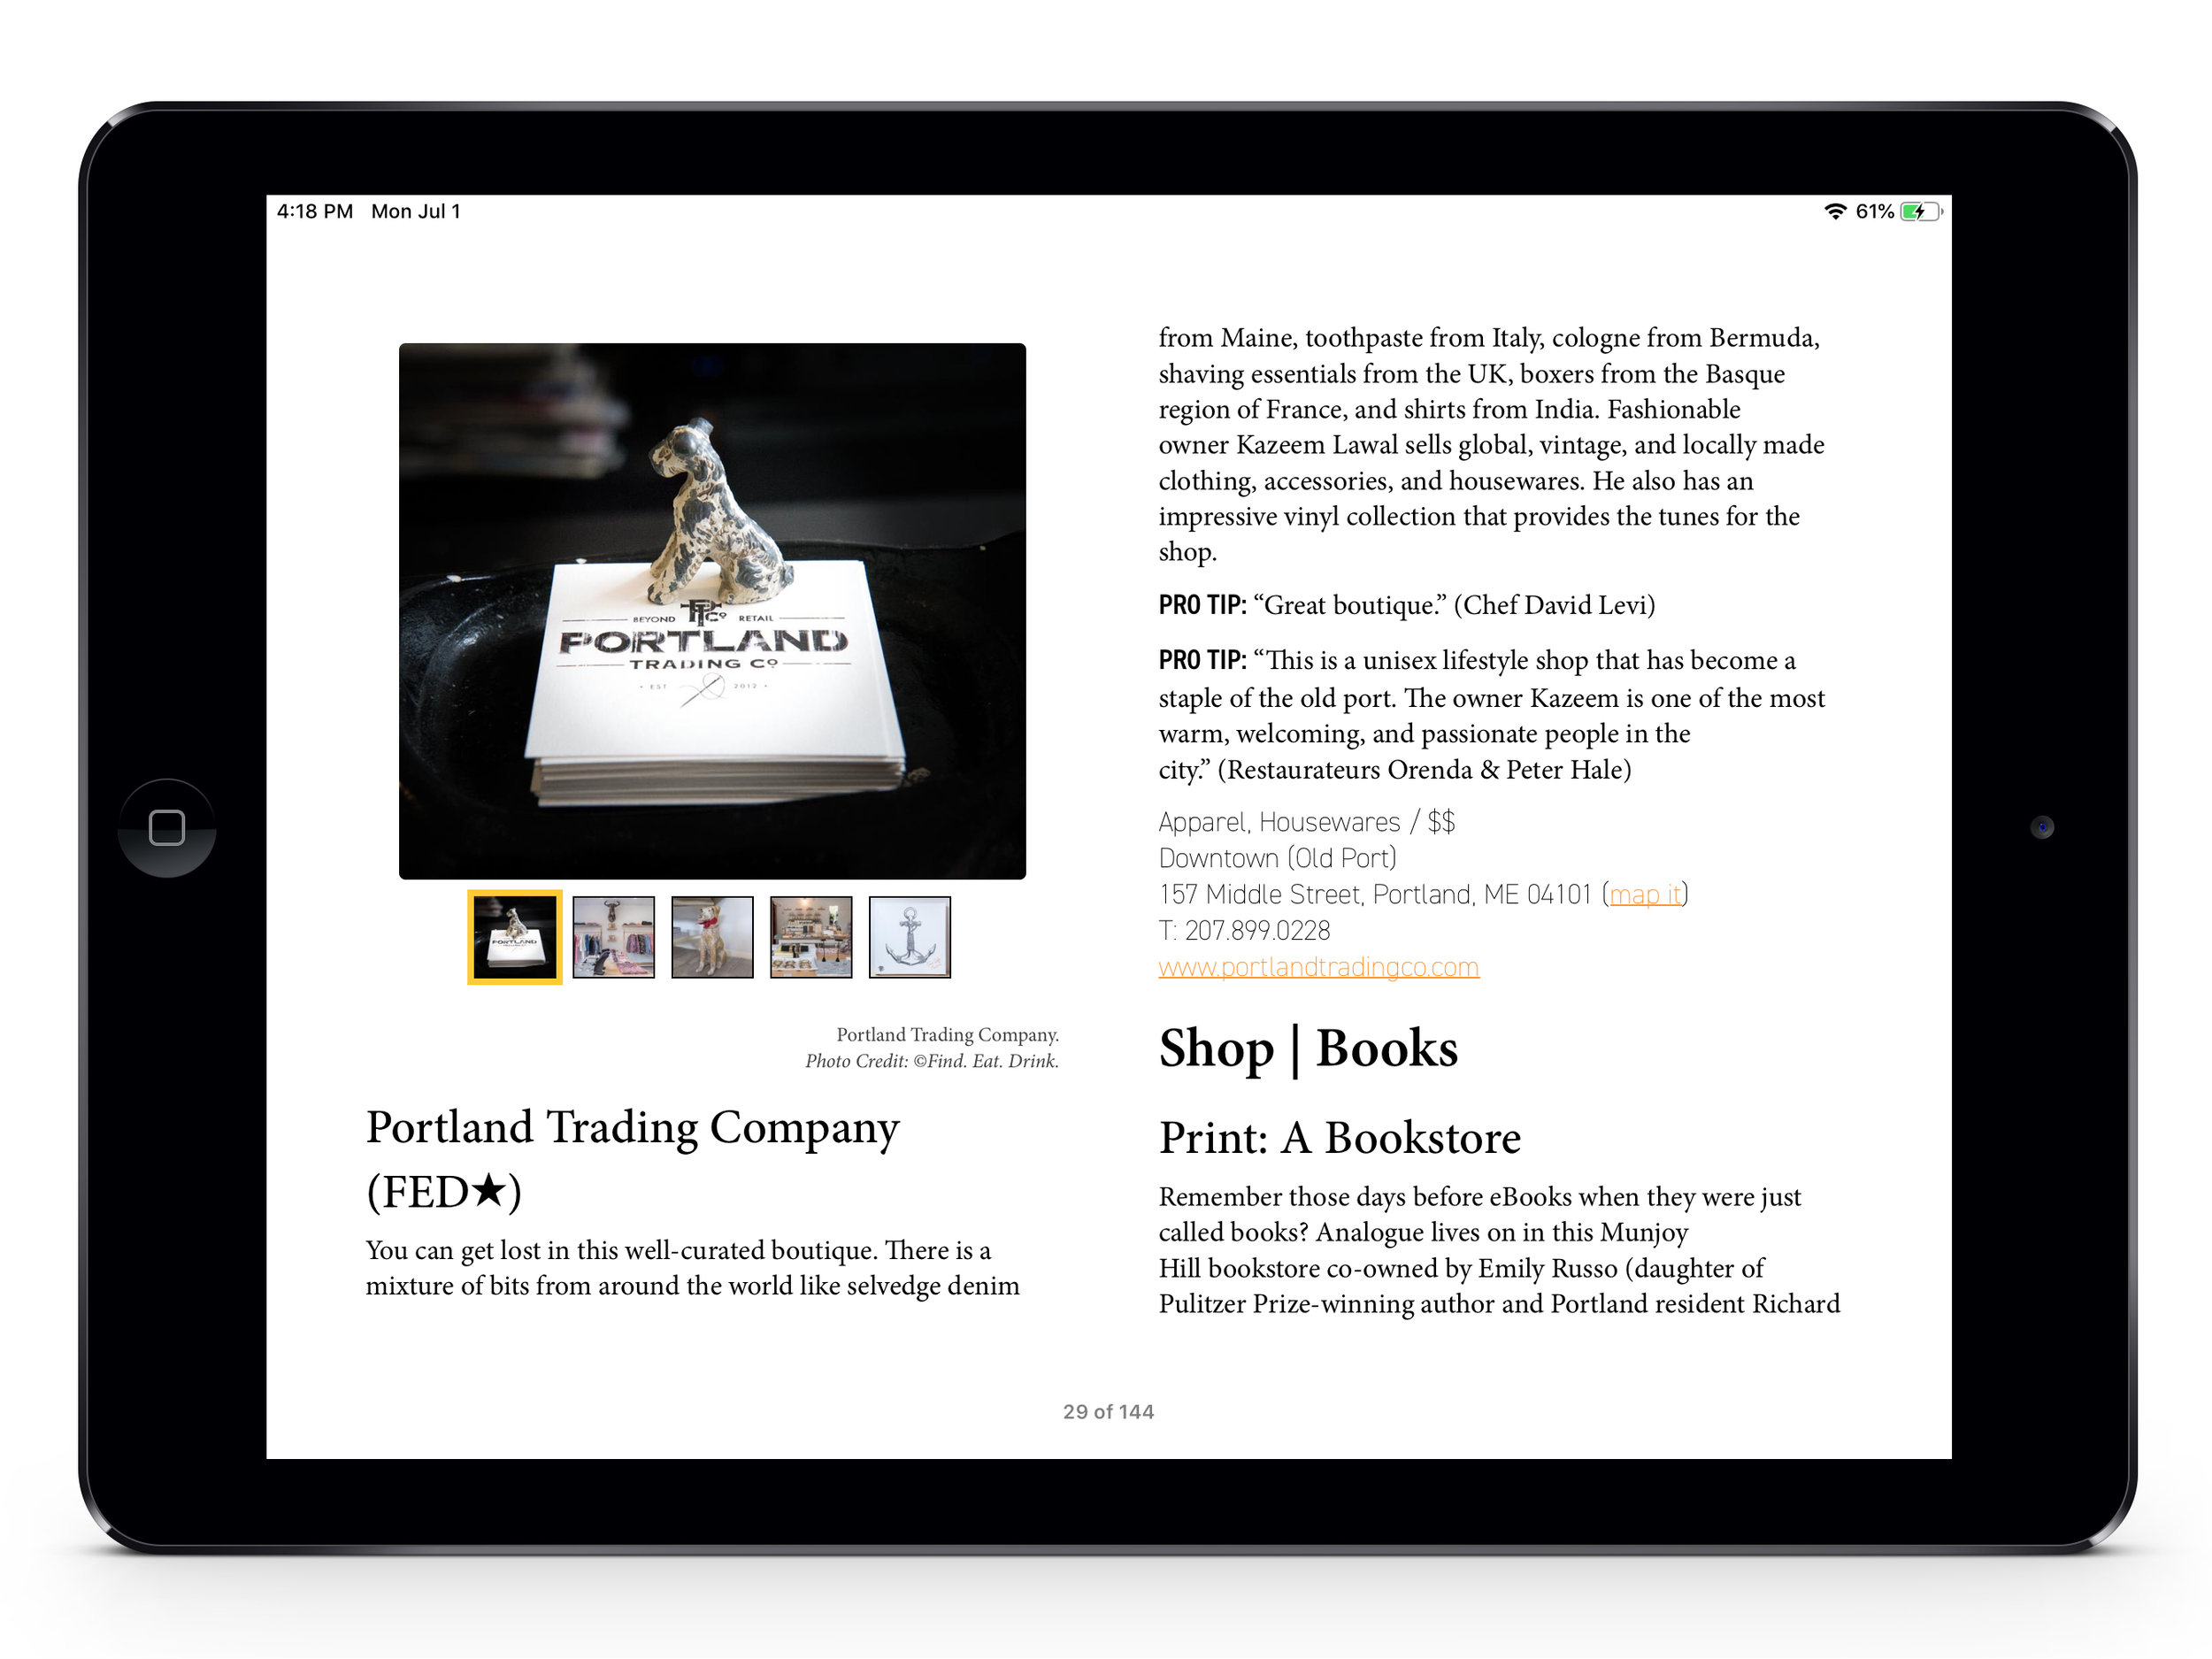 iPadAir_PortlandME_Screenshots_Landscape_1.7.jpg